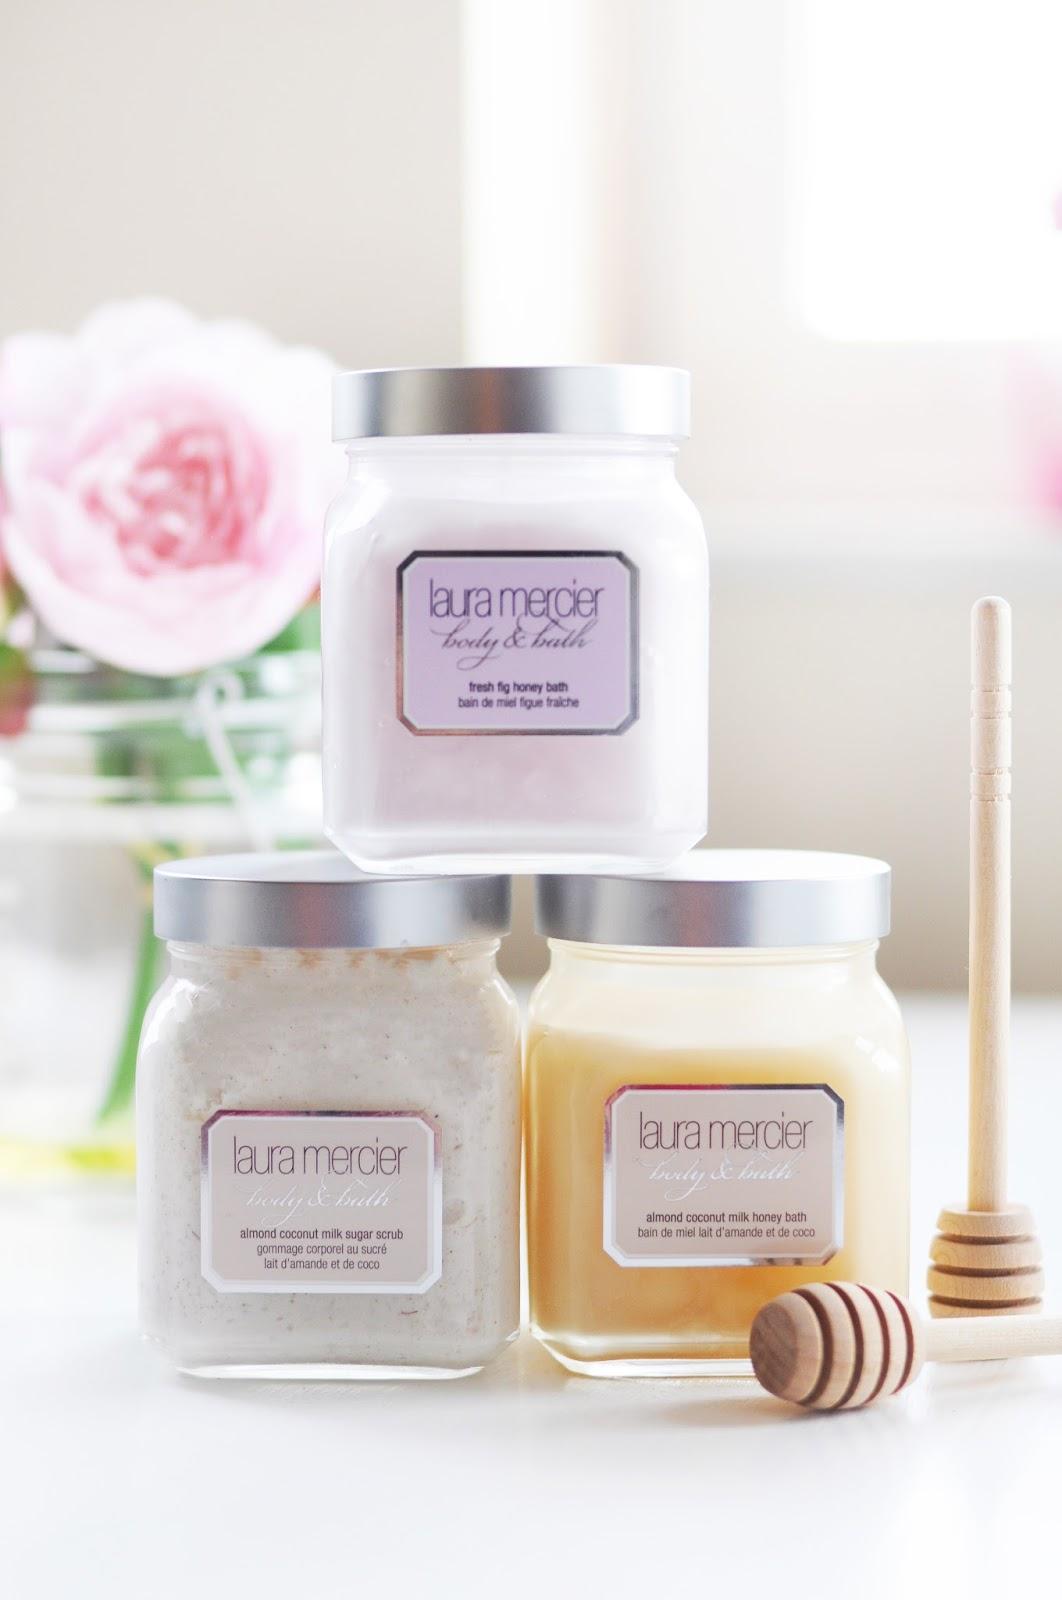 laura mercier bath honey